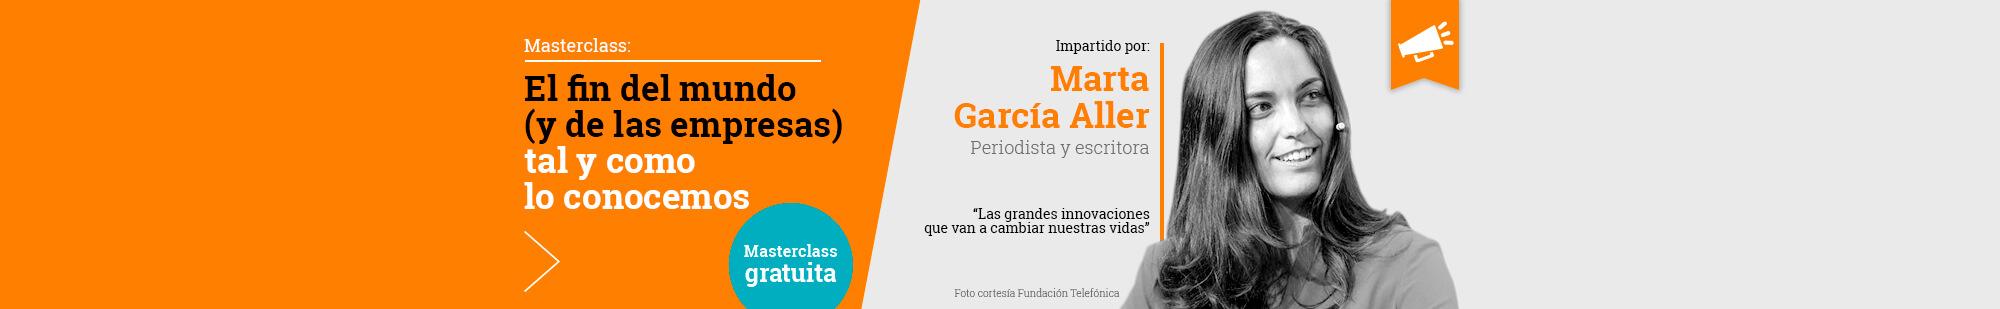 MC_Marta_Garcia_Aller_Ficha